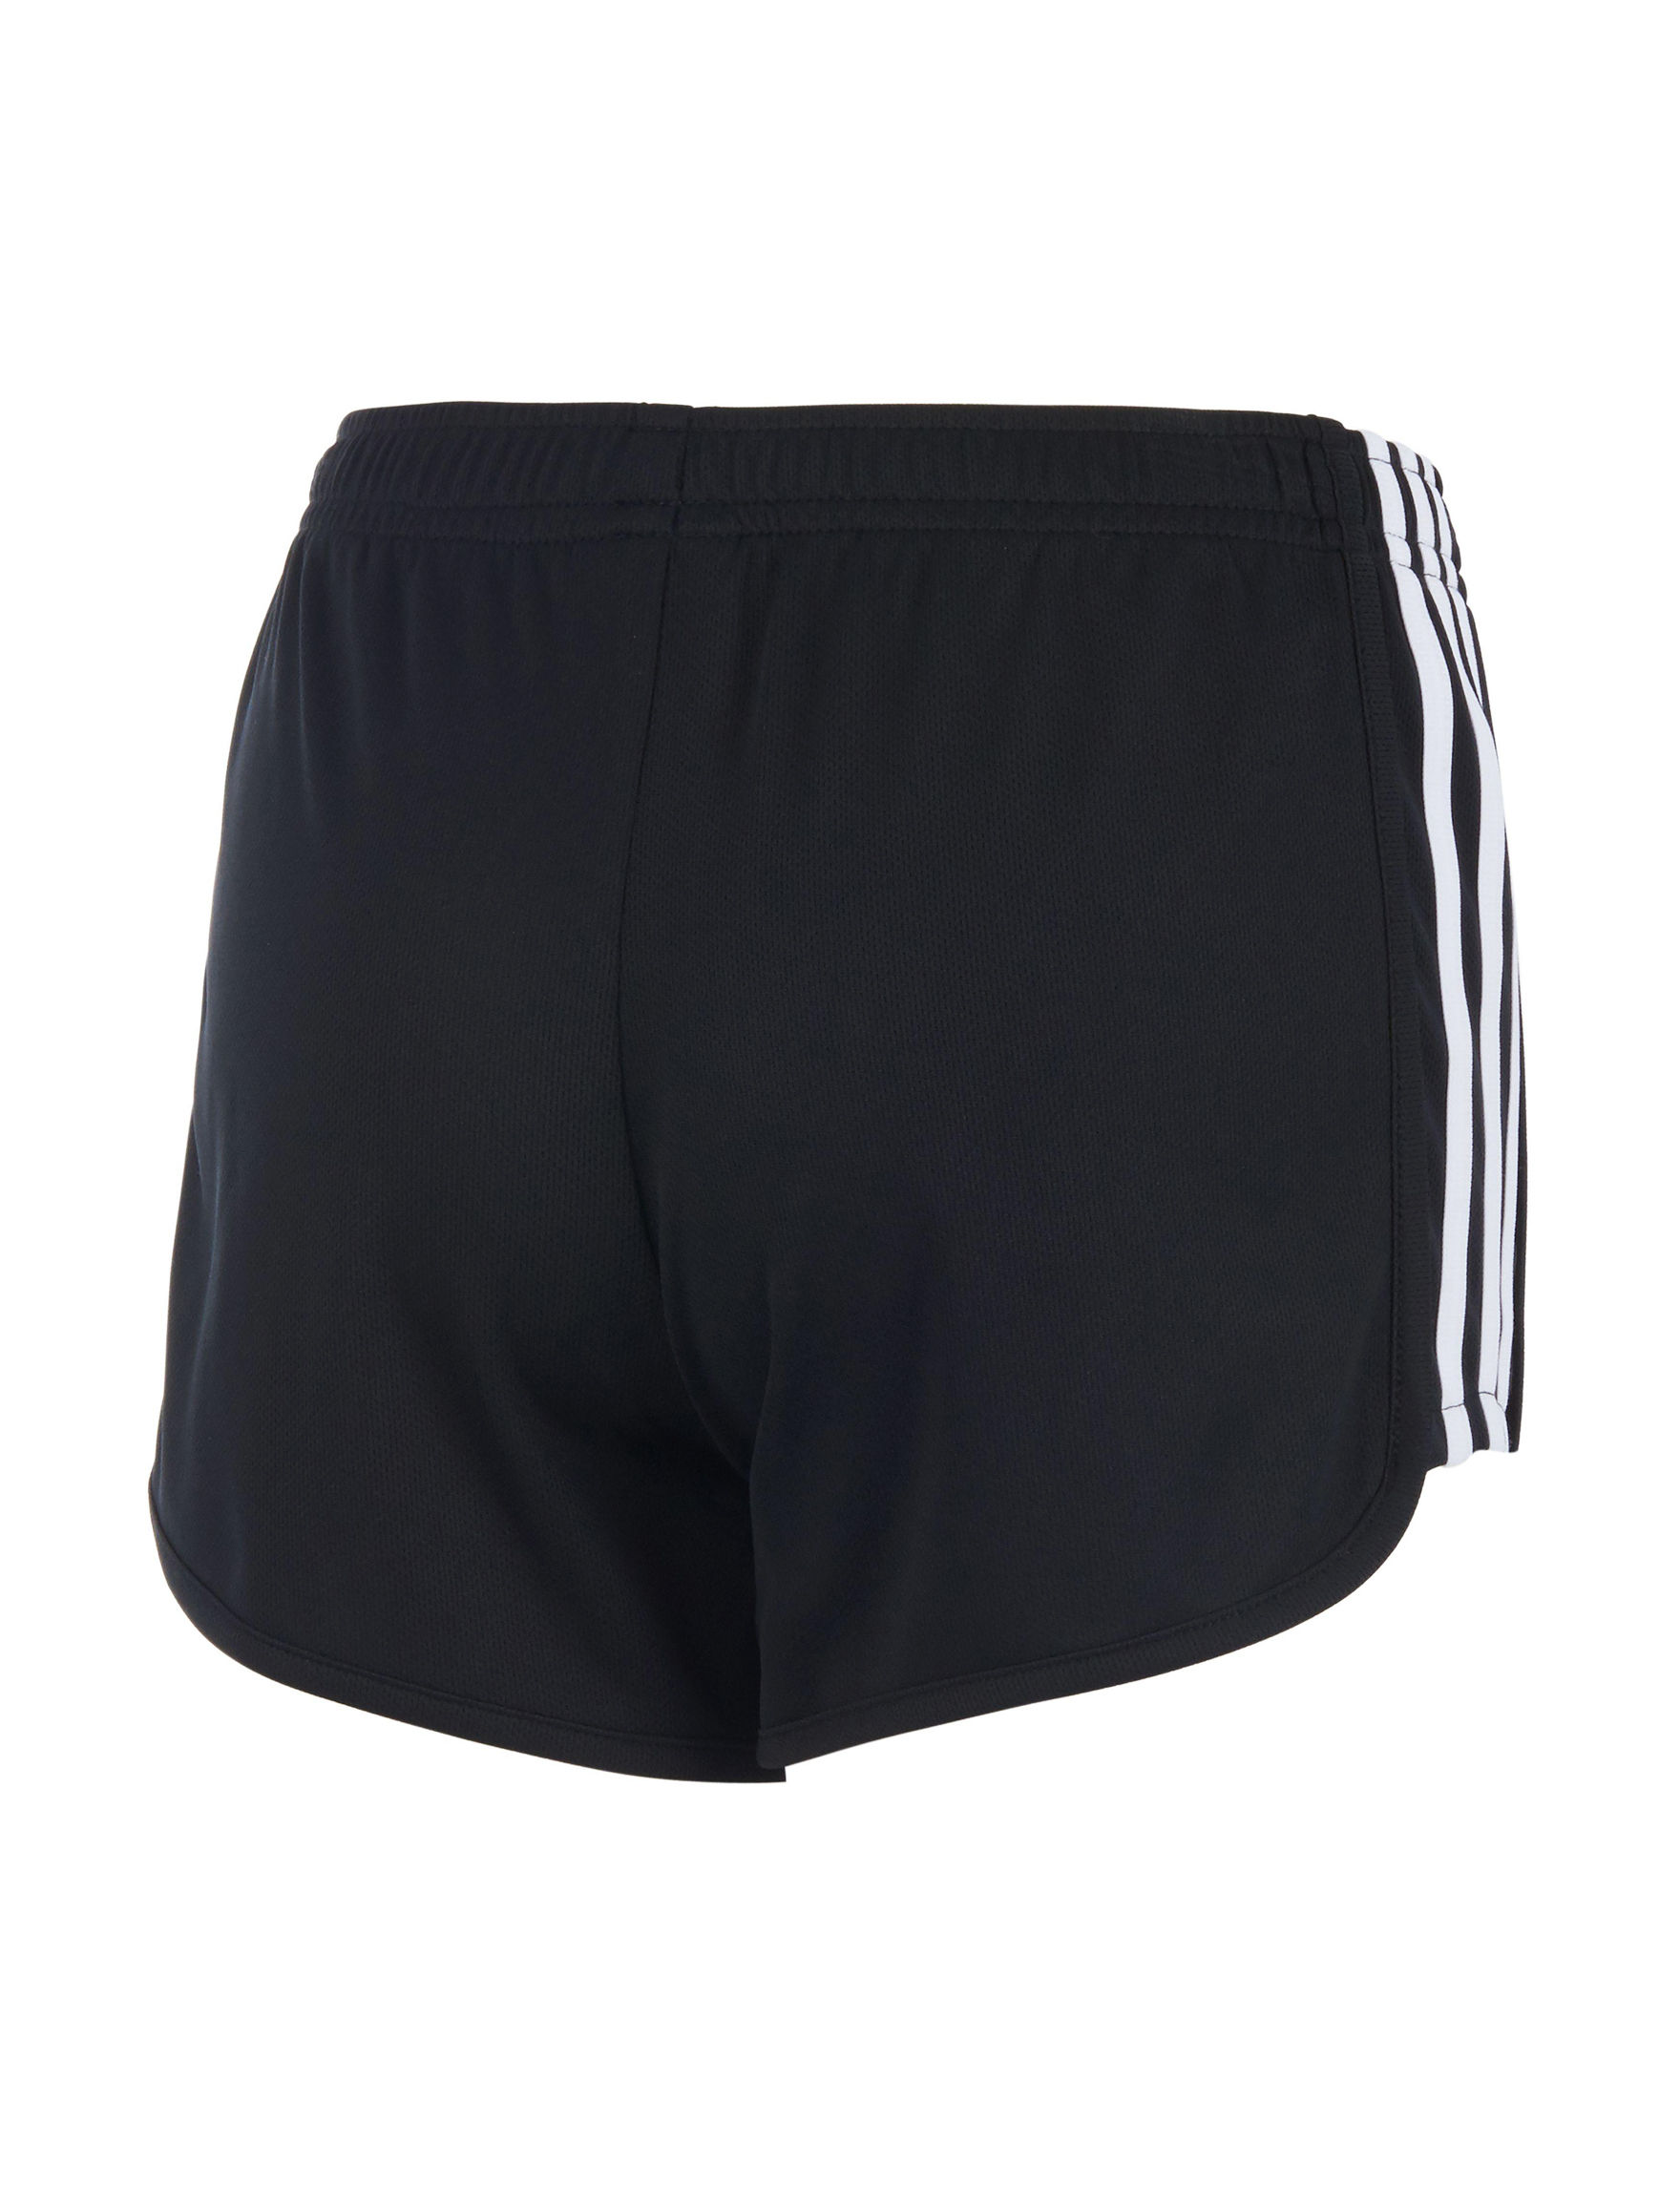 eb9f4f1376b adidas Signature 3-Stripe Mesh Shorts - Girls 7-16